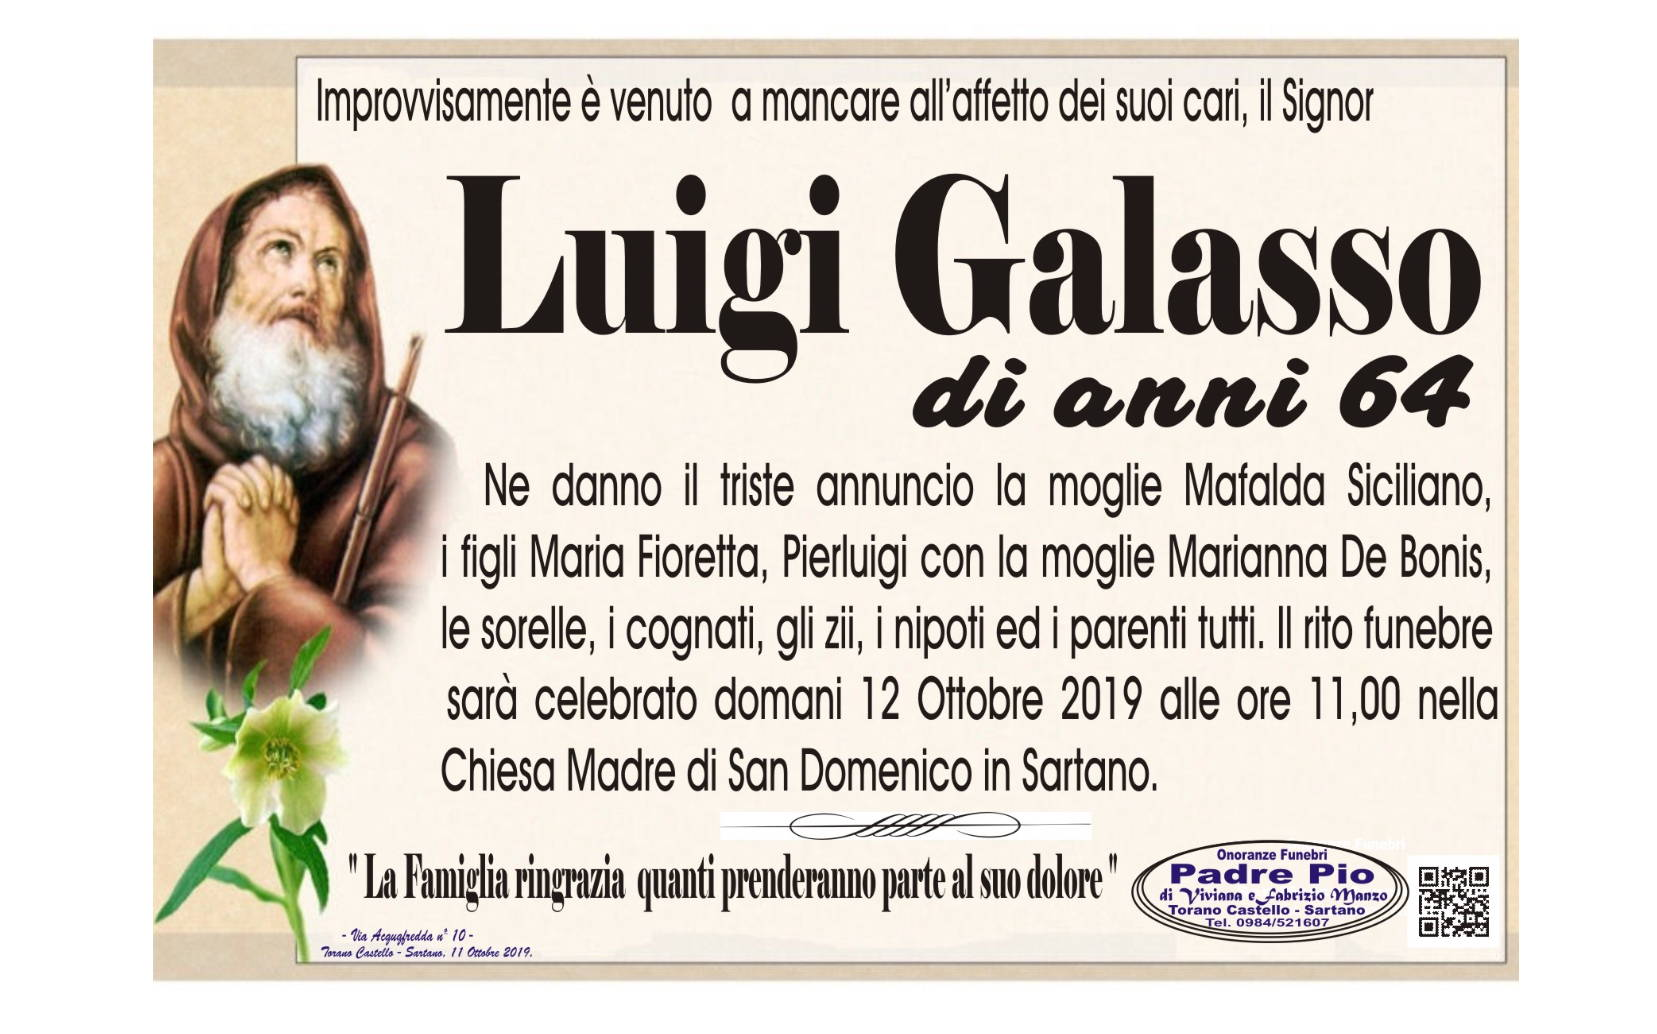 Luigi Galasso